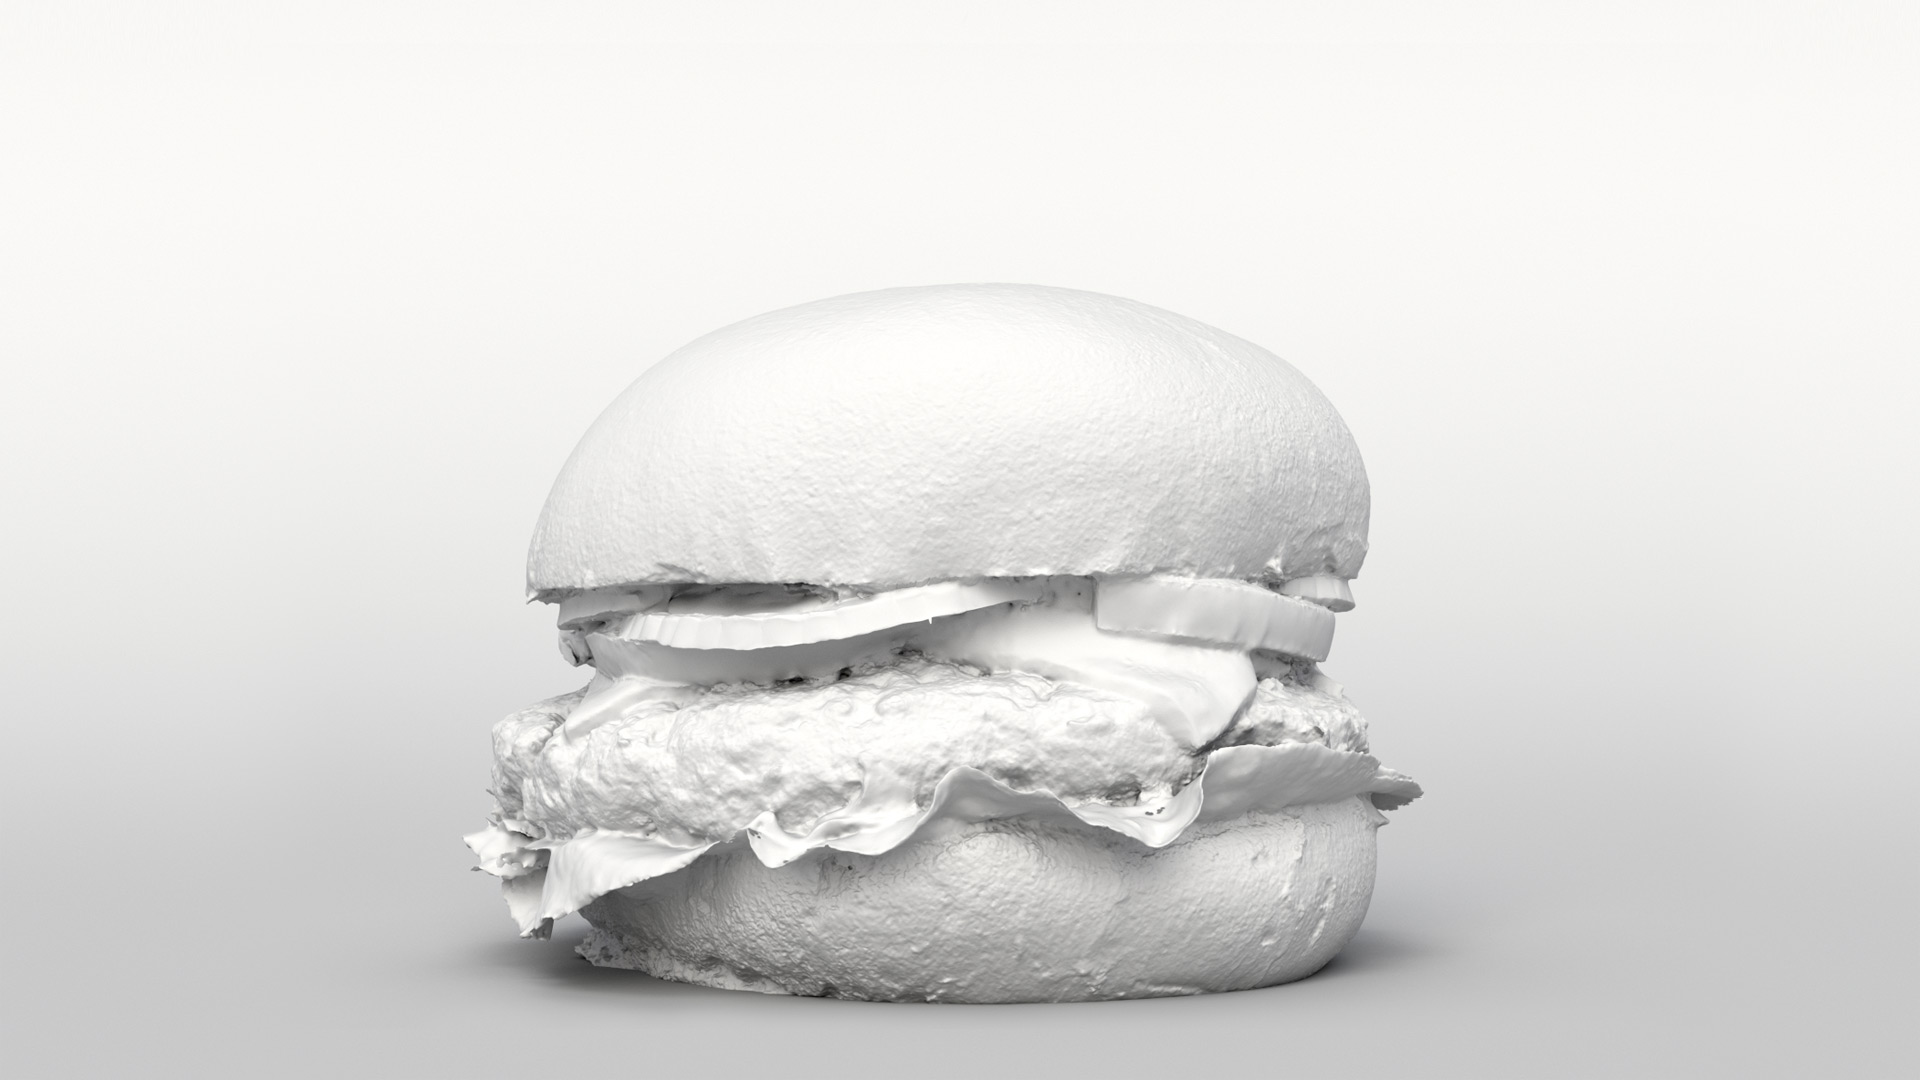 Burger_turntable_00048